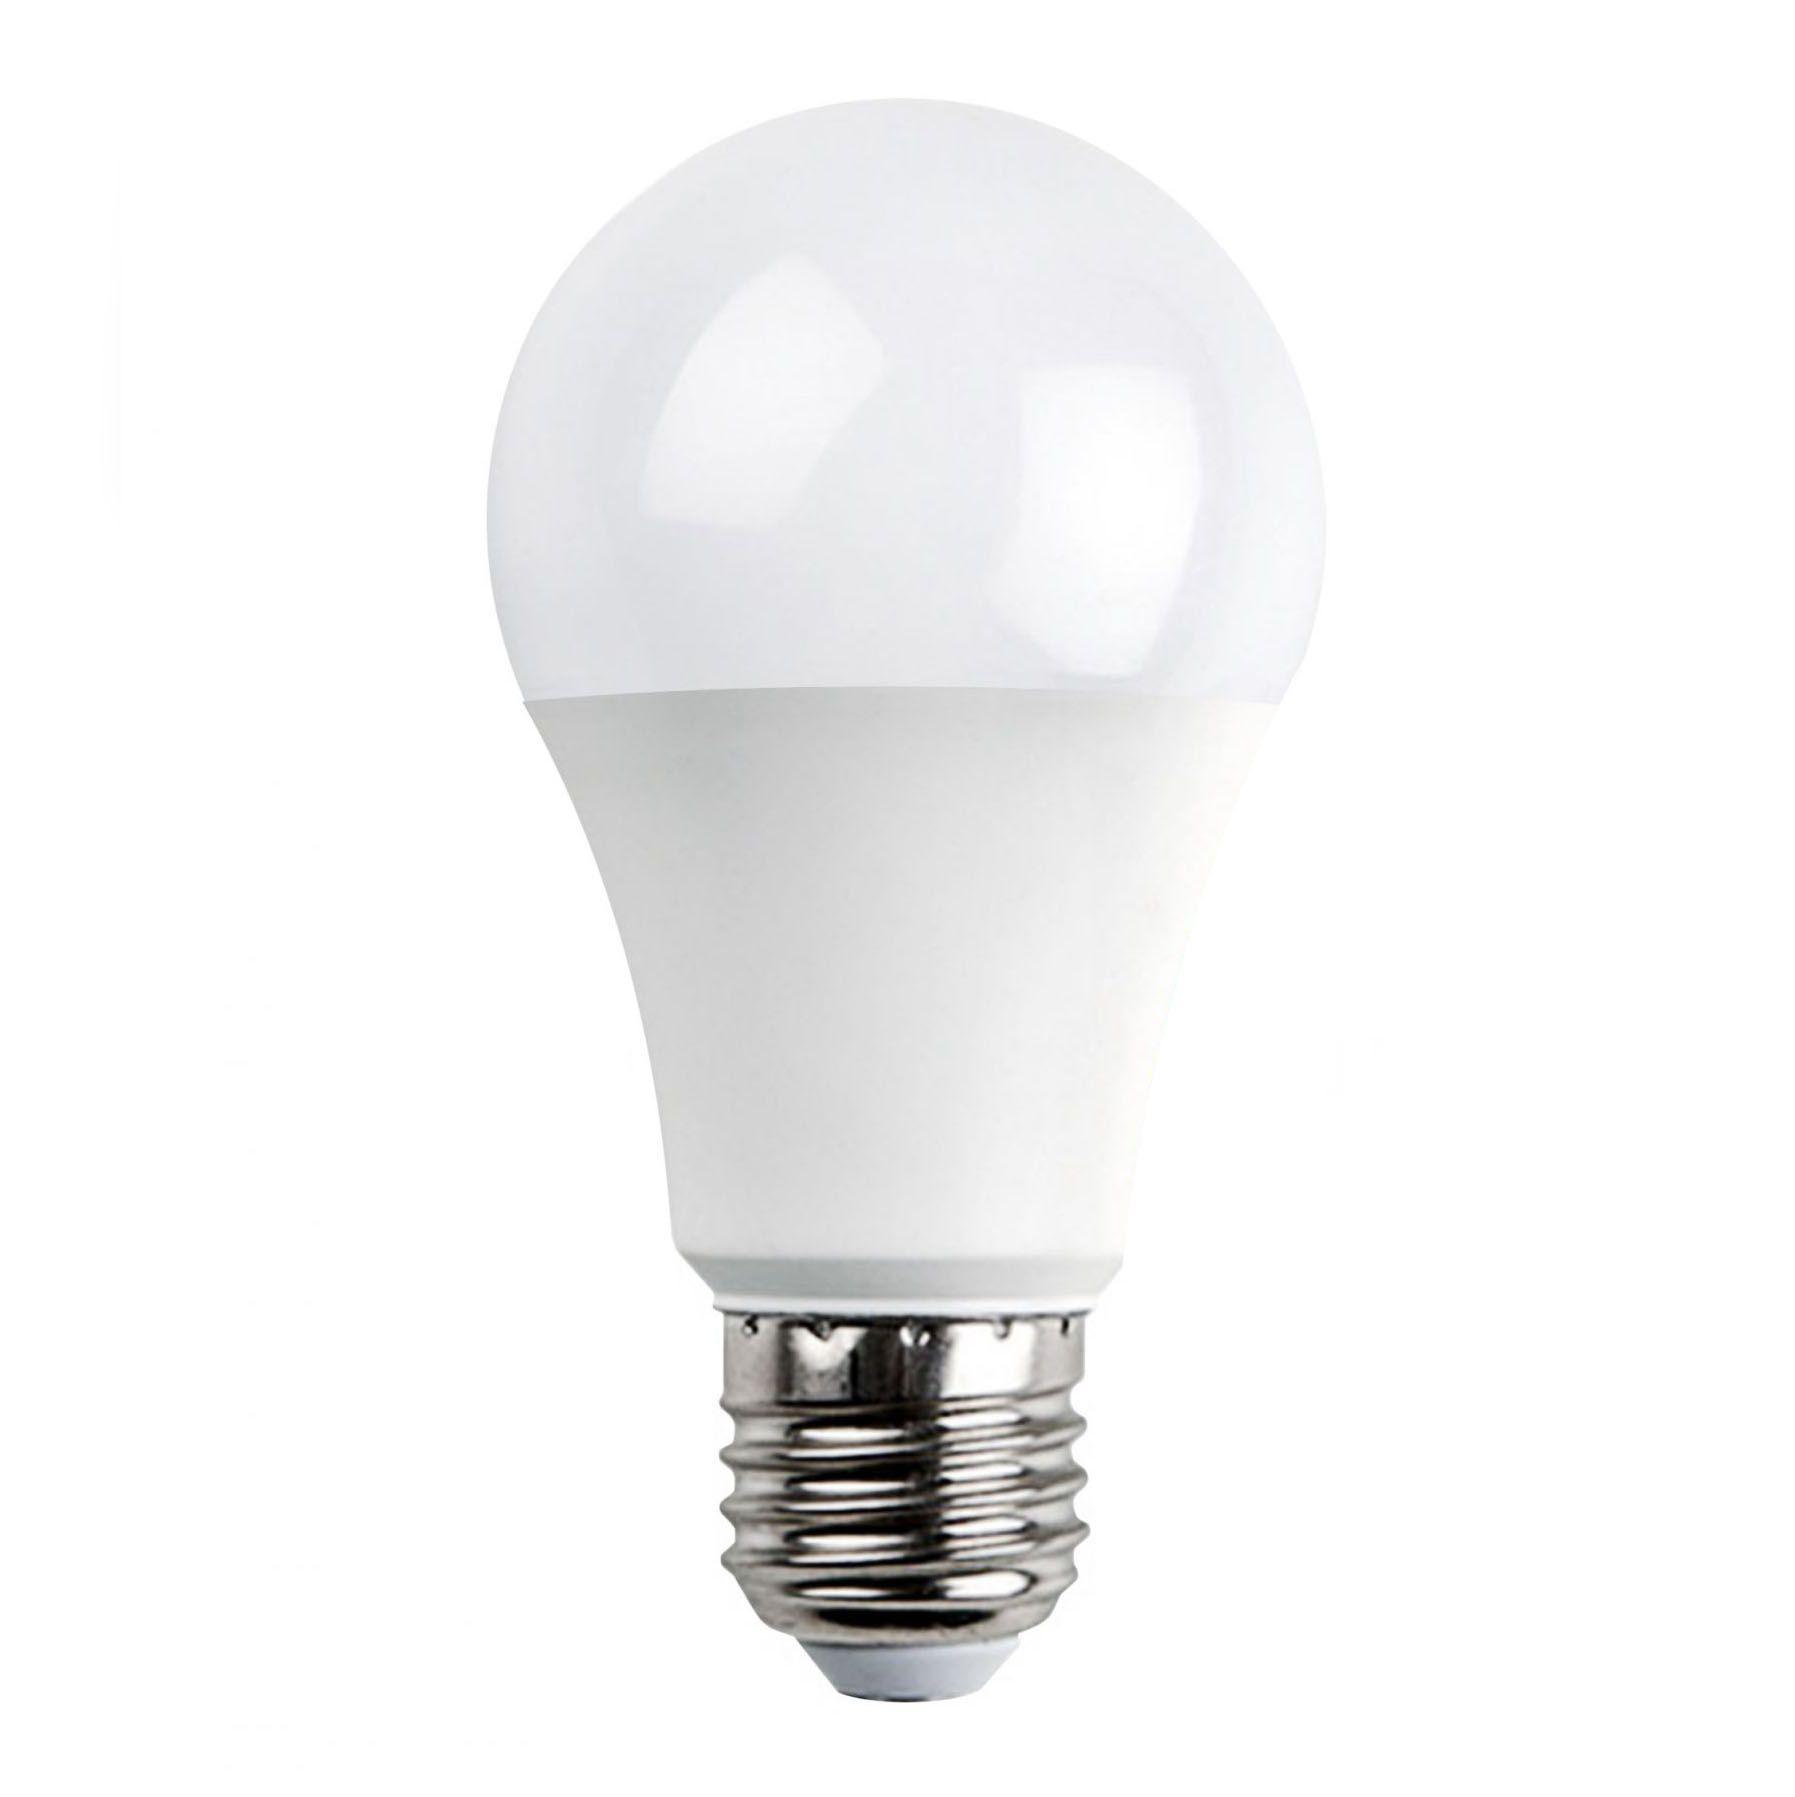 954 BULBO LED A19 9W -LOTE DE 24 PIEZAS